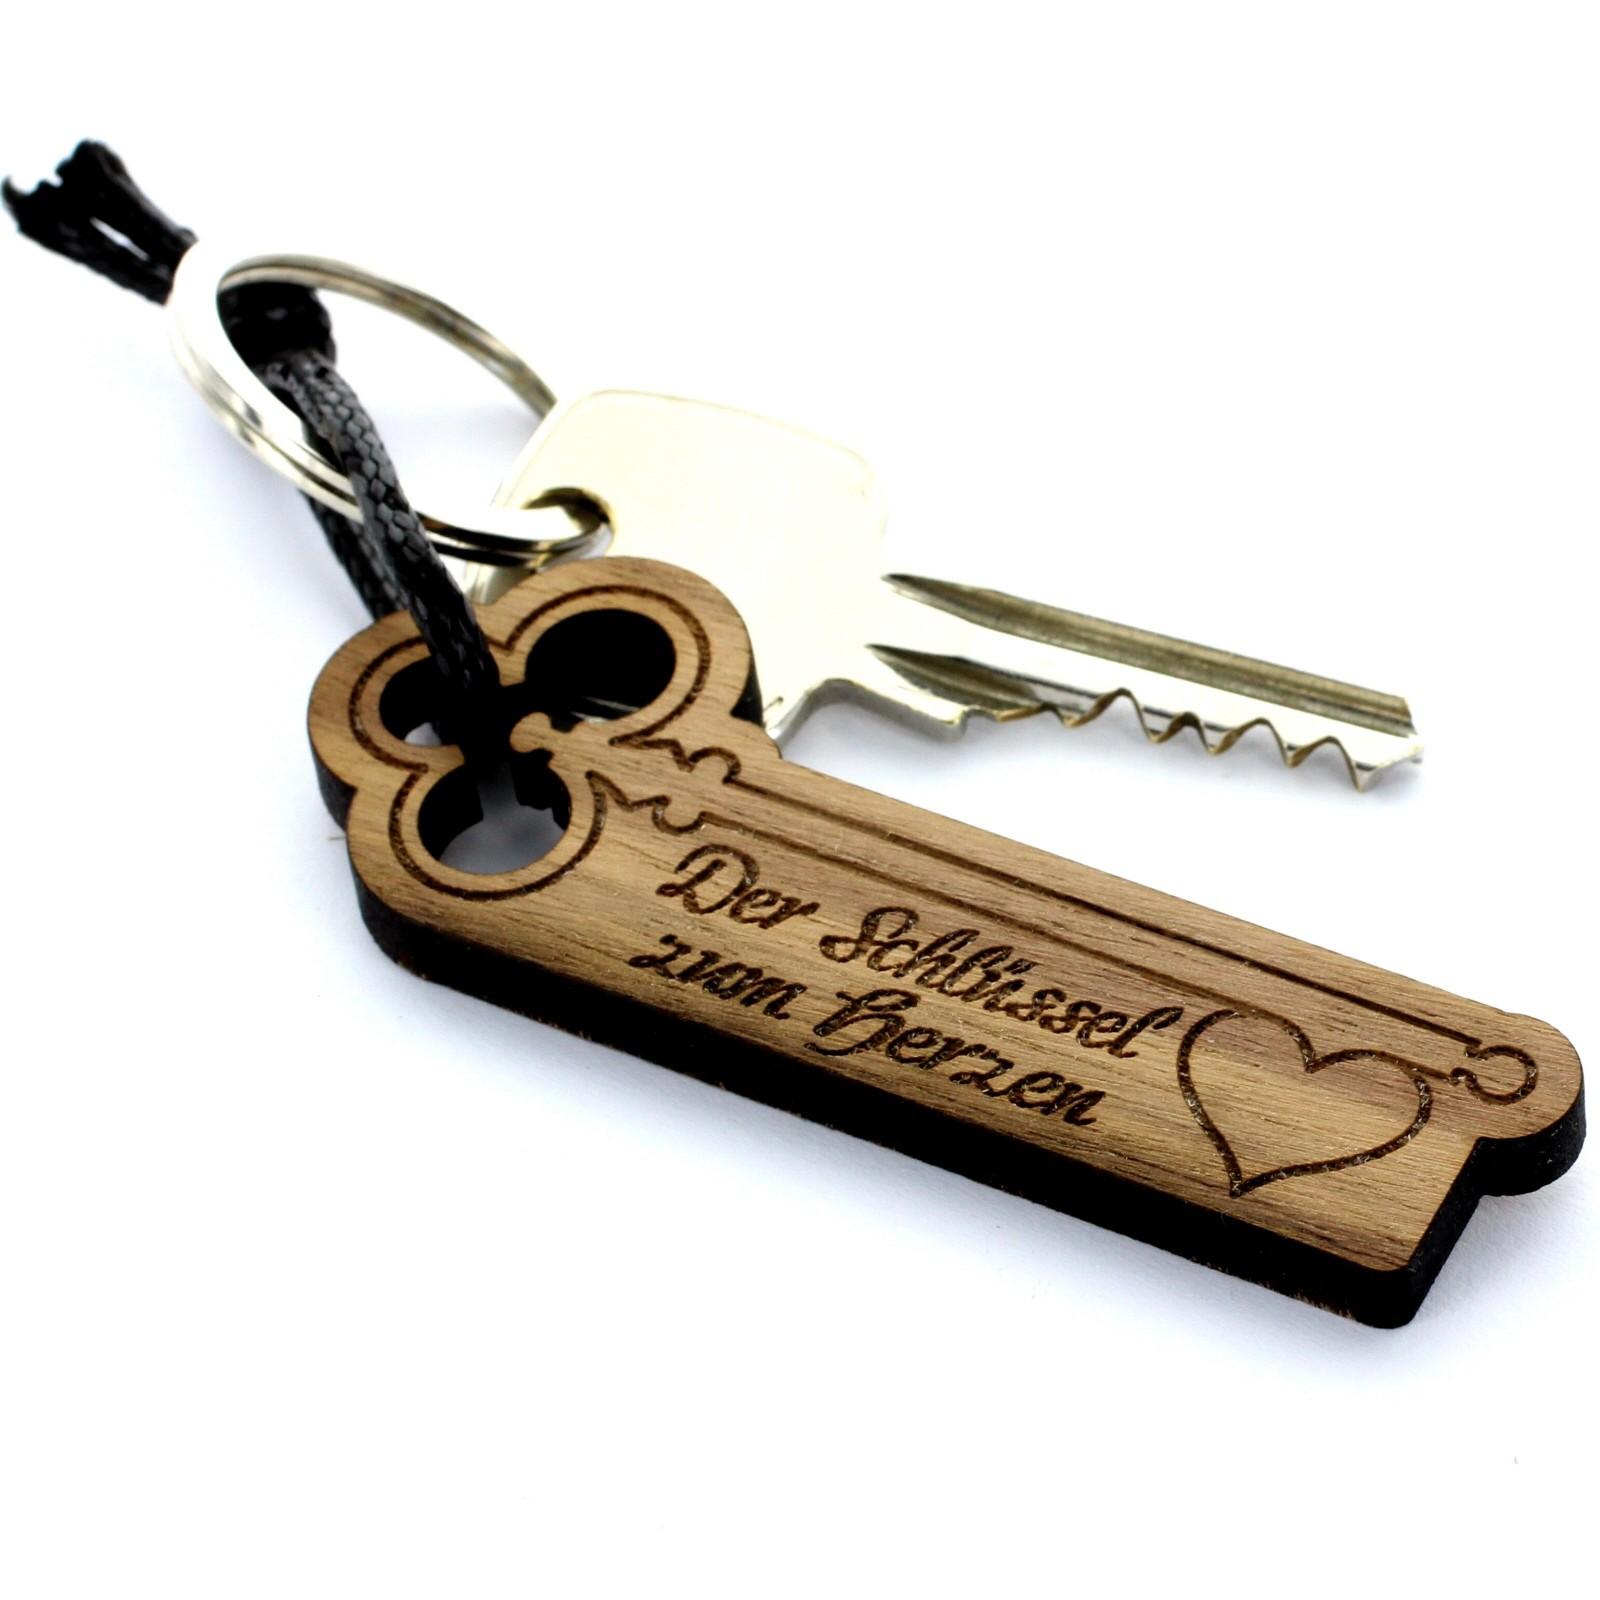 Modell Schlüssel